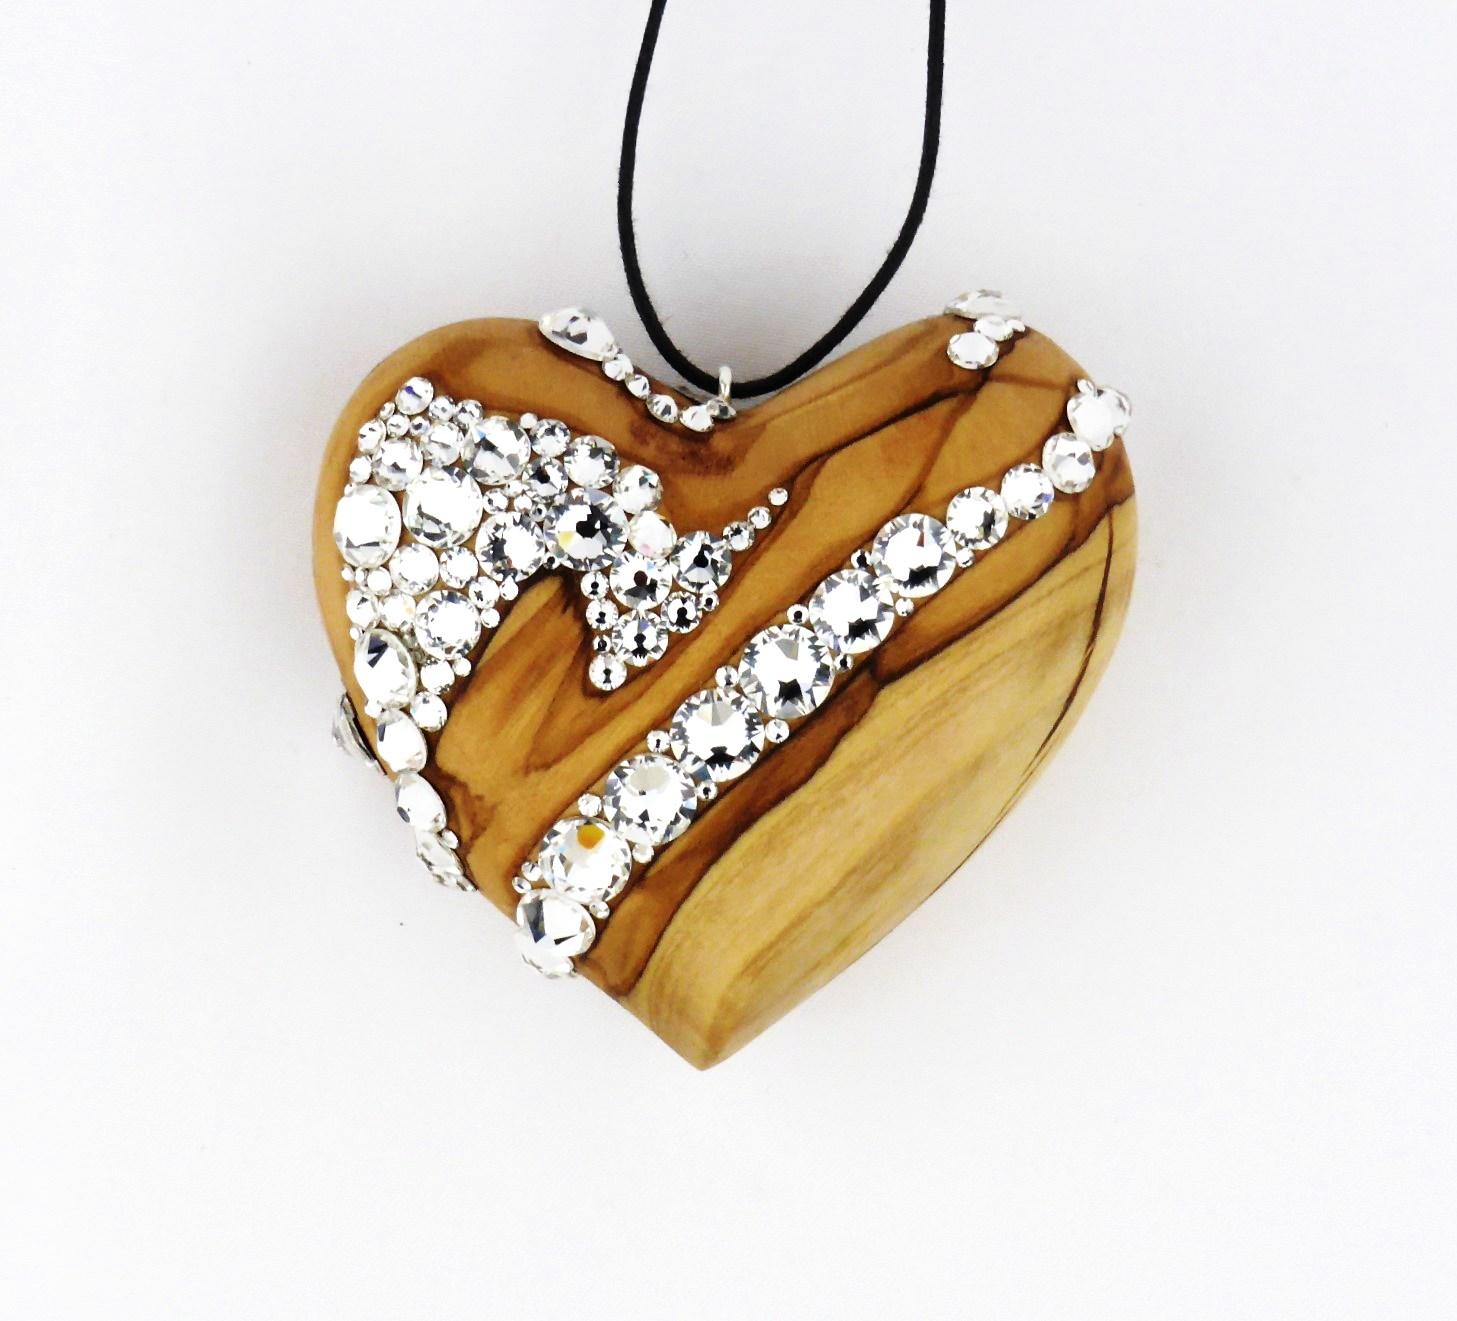 woodenloveheart